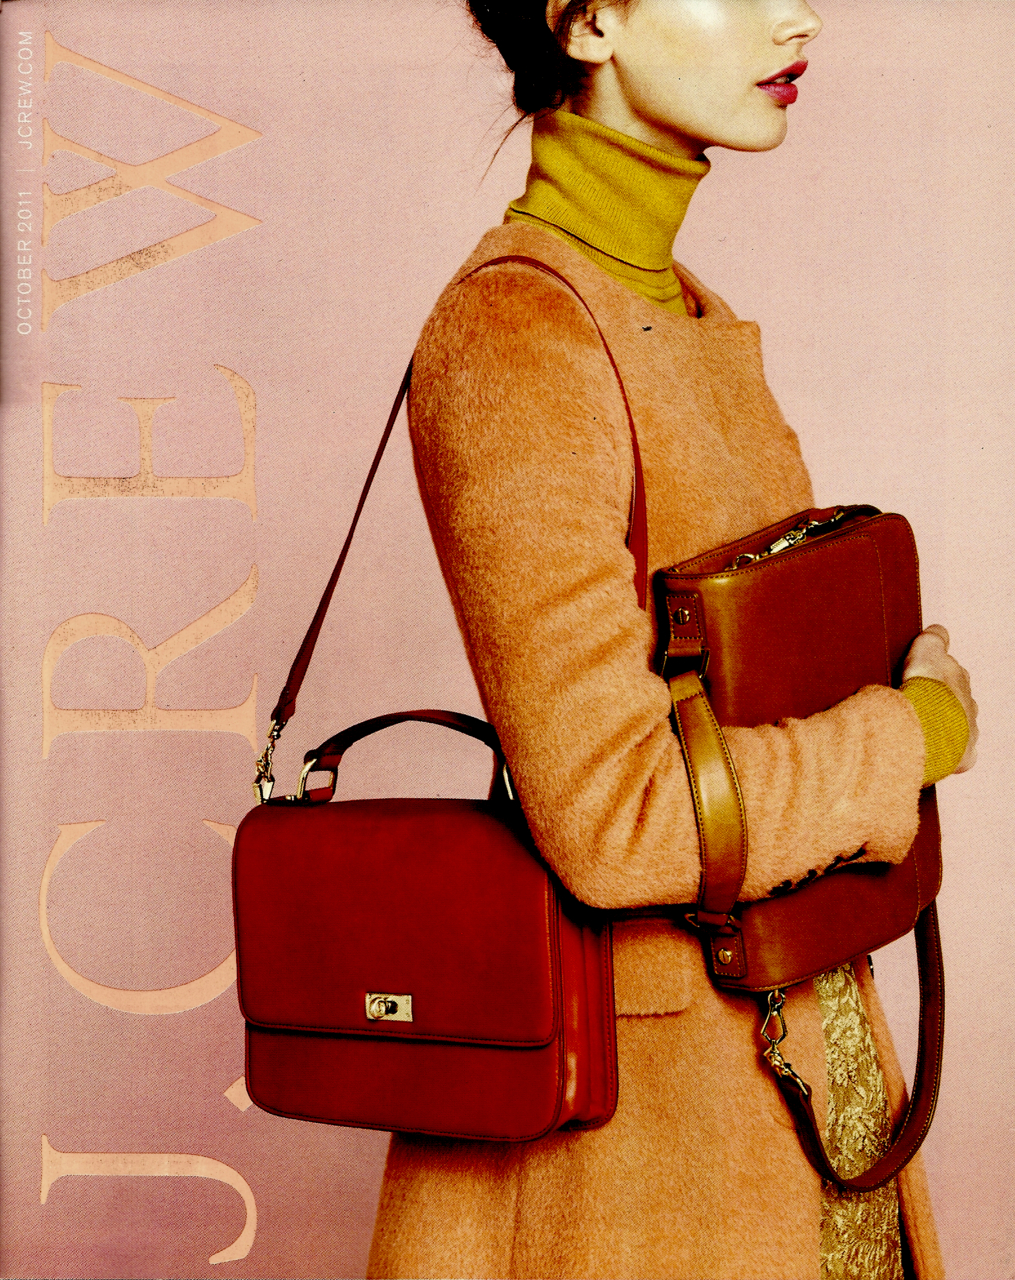 laurel-iz-fashion :     J.Crew catalogue, you clever minx, you had me at hello.